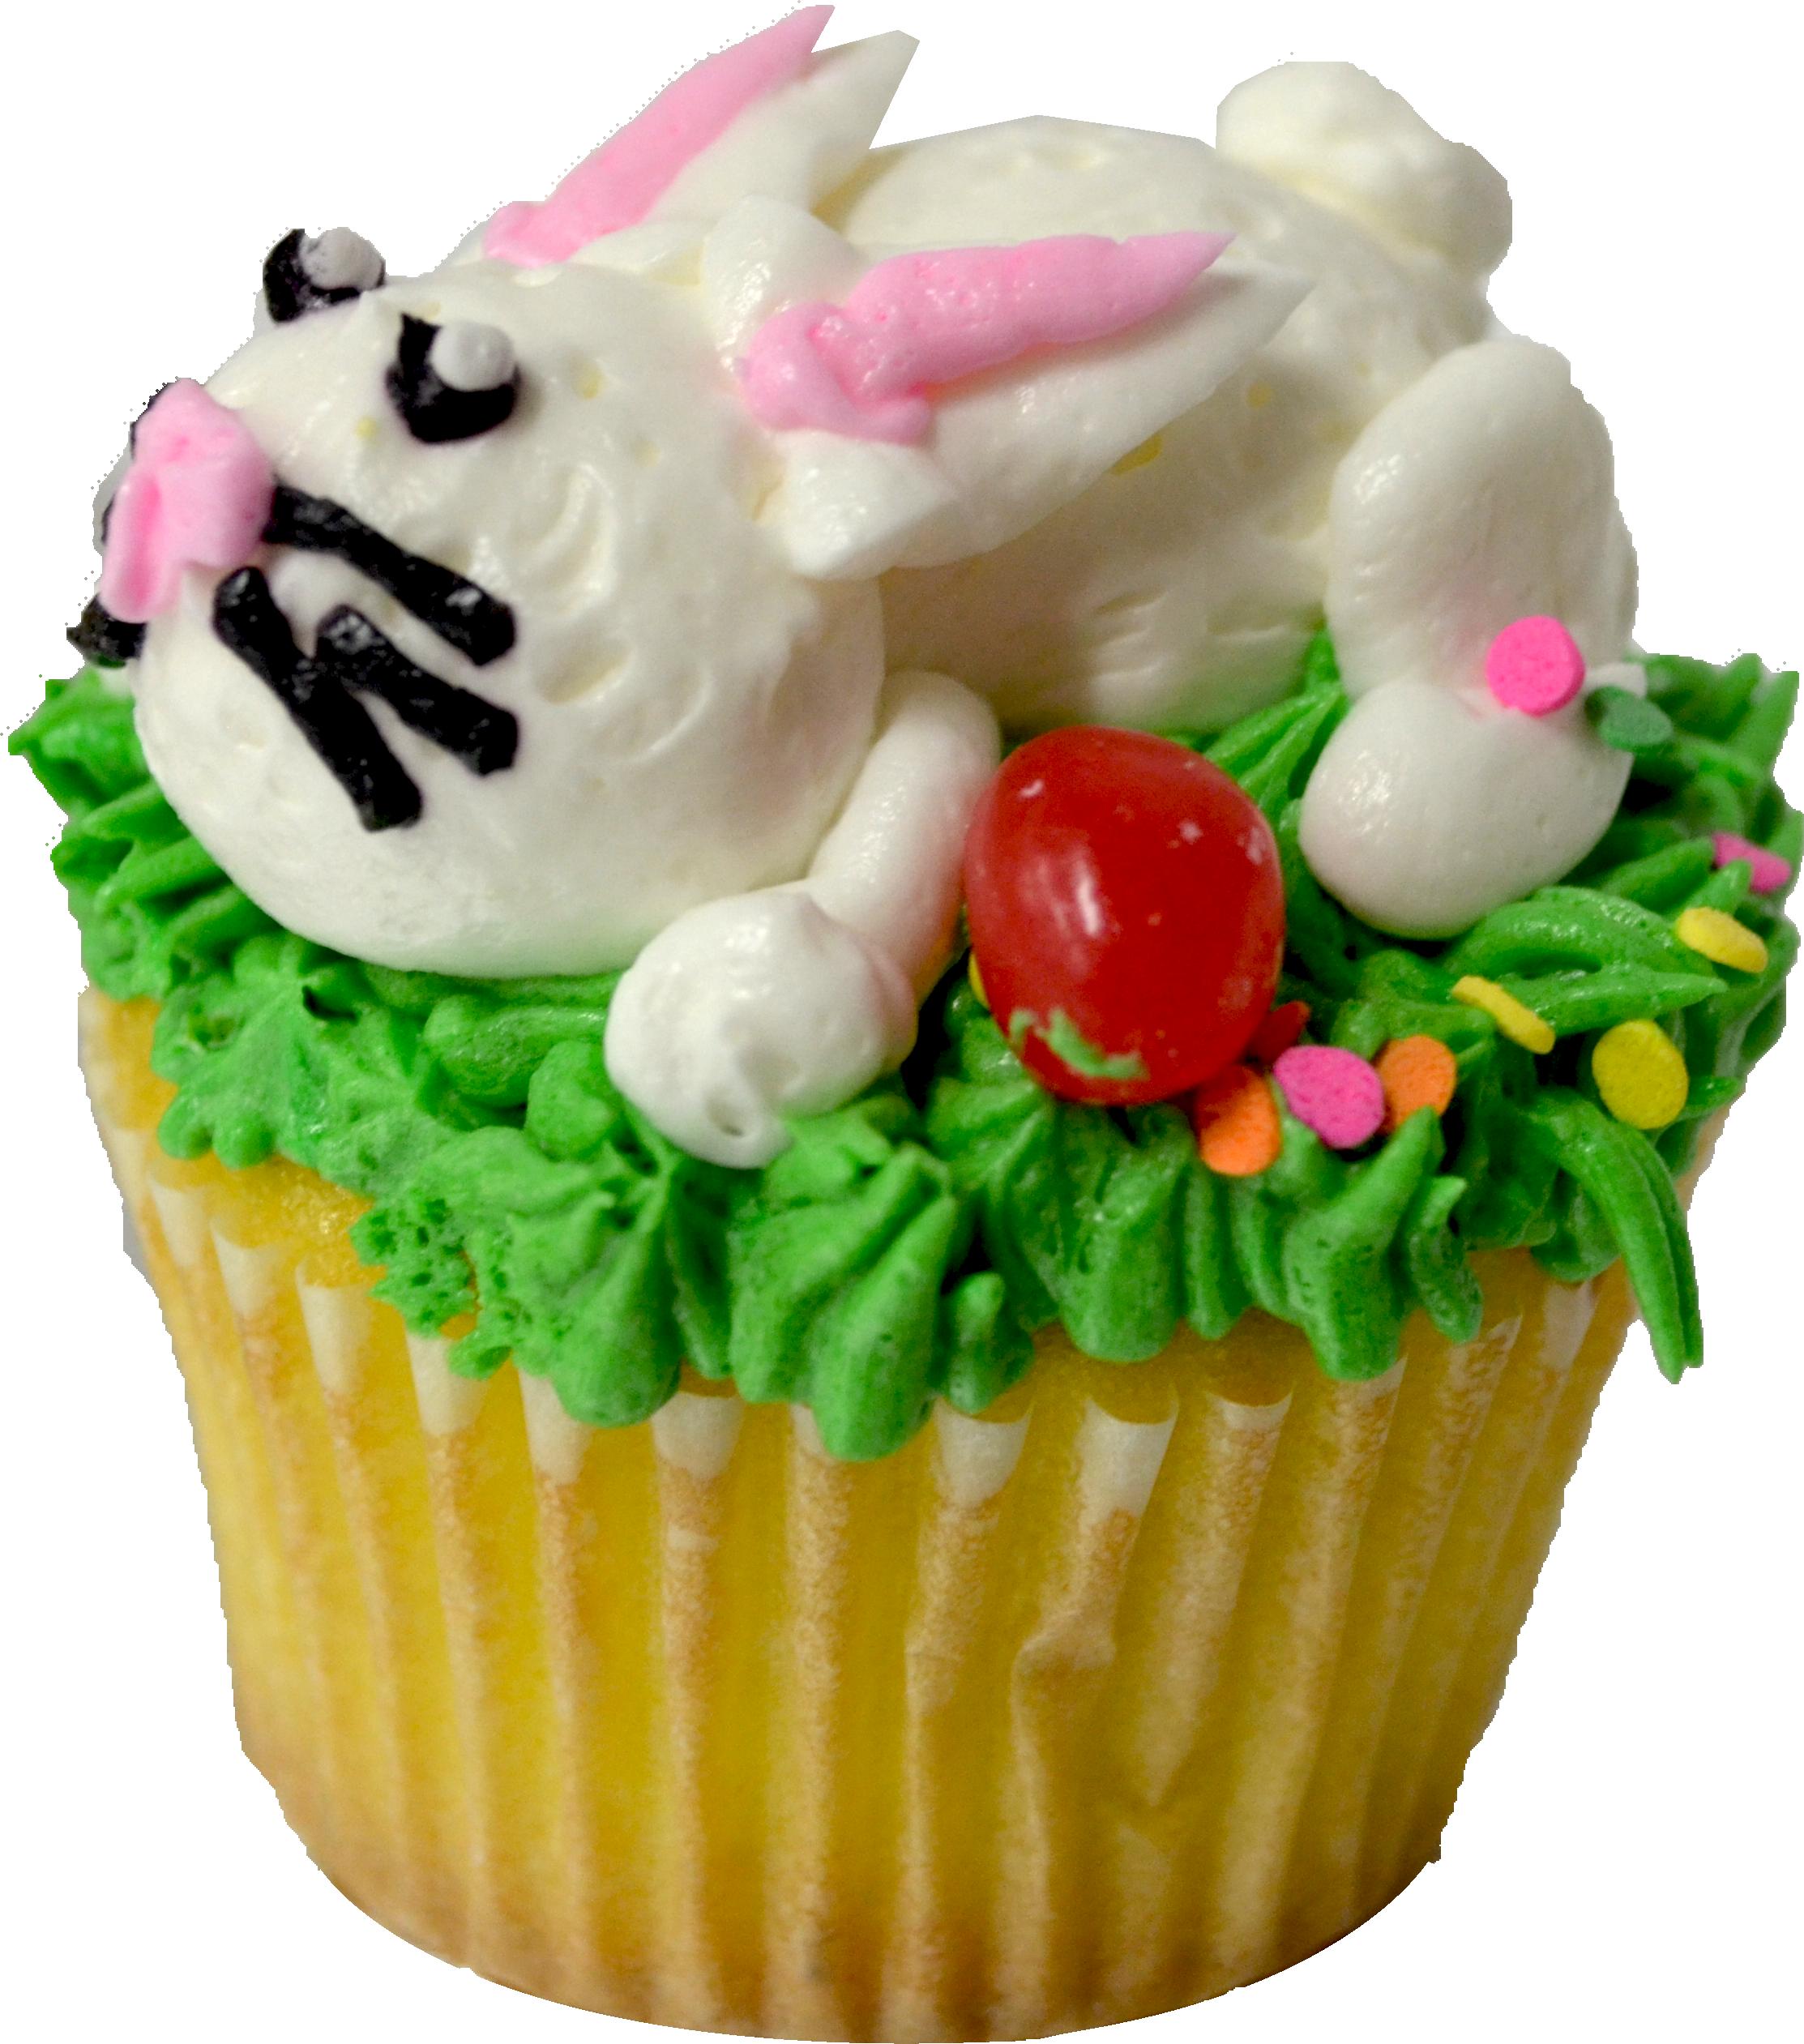 easter cupcakes abc. Clipart bunny cupcake